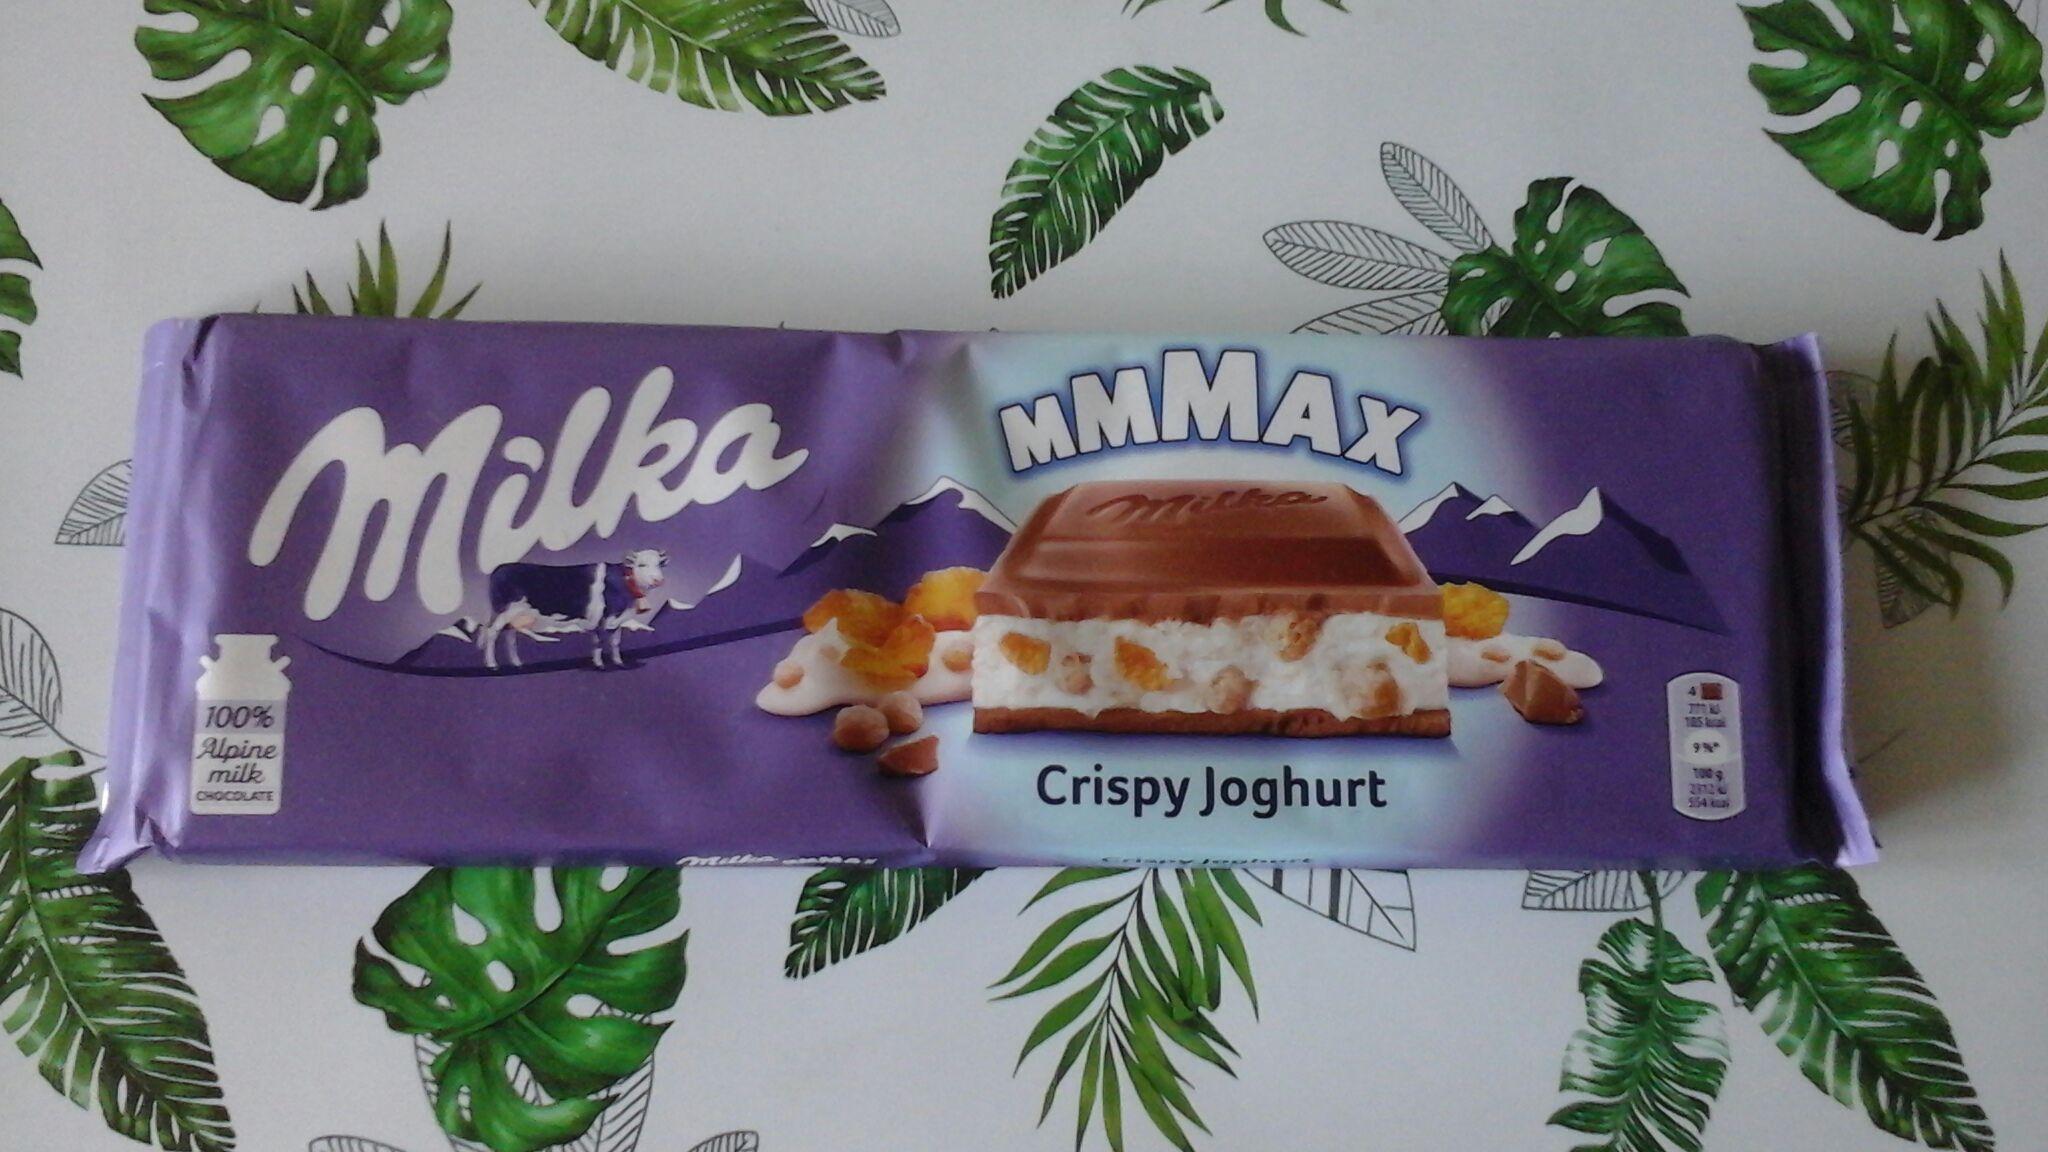 Czekolada Milka Crispy Joghurt 300g Tesco Gliwice